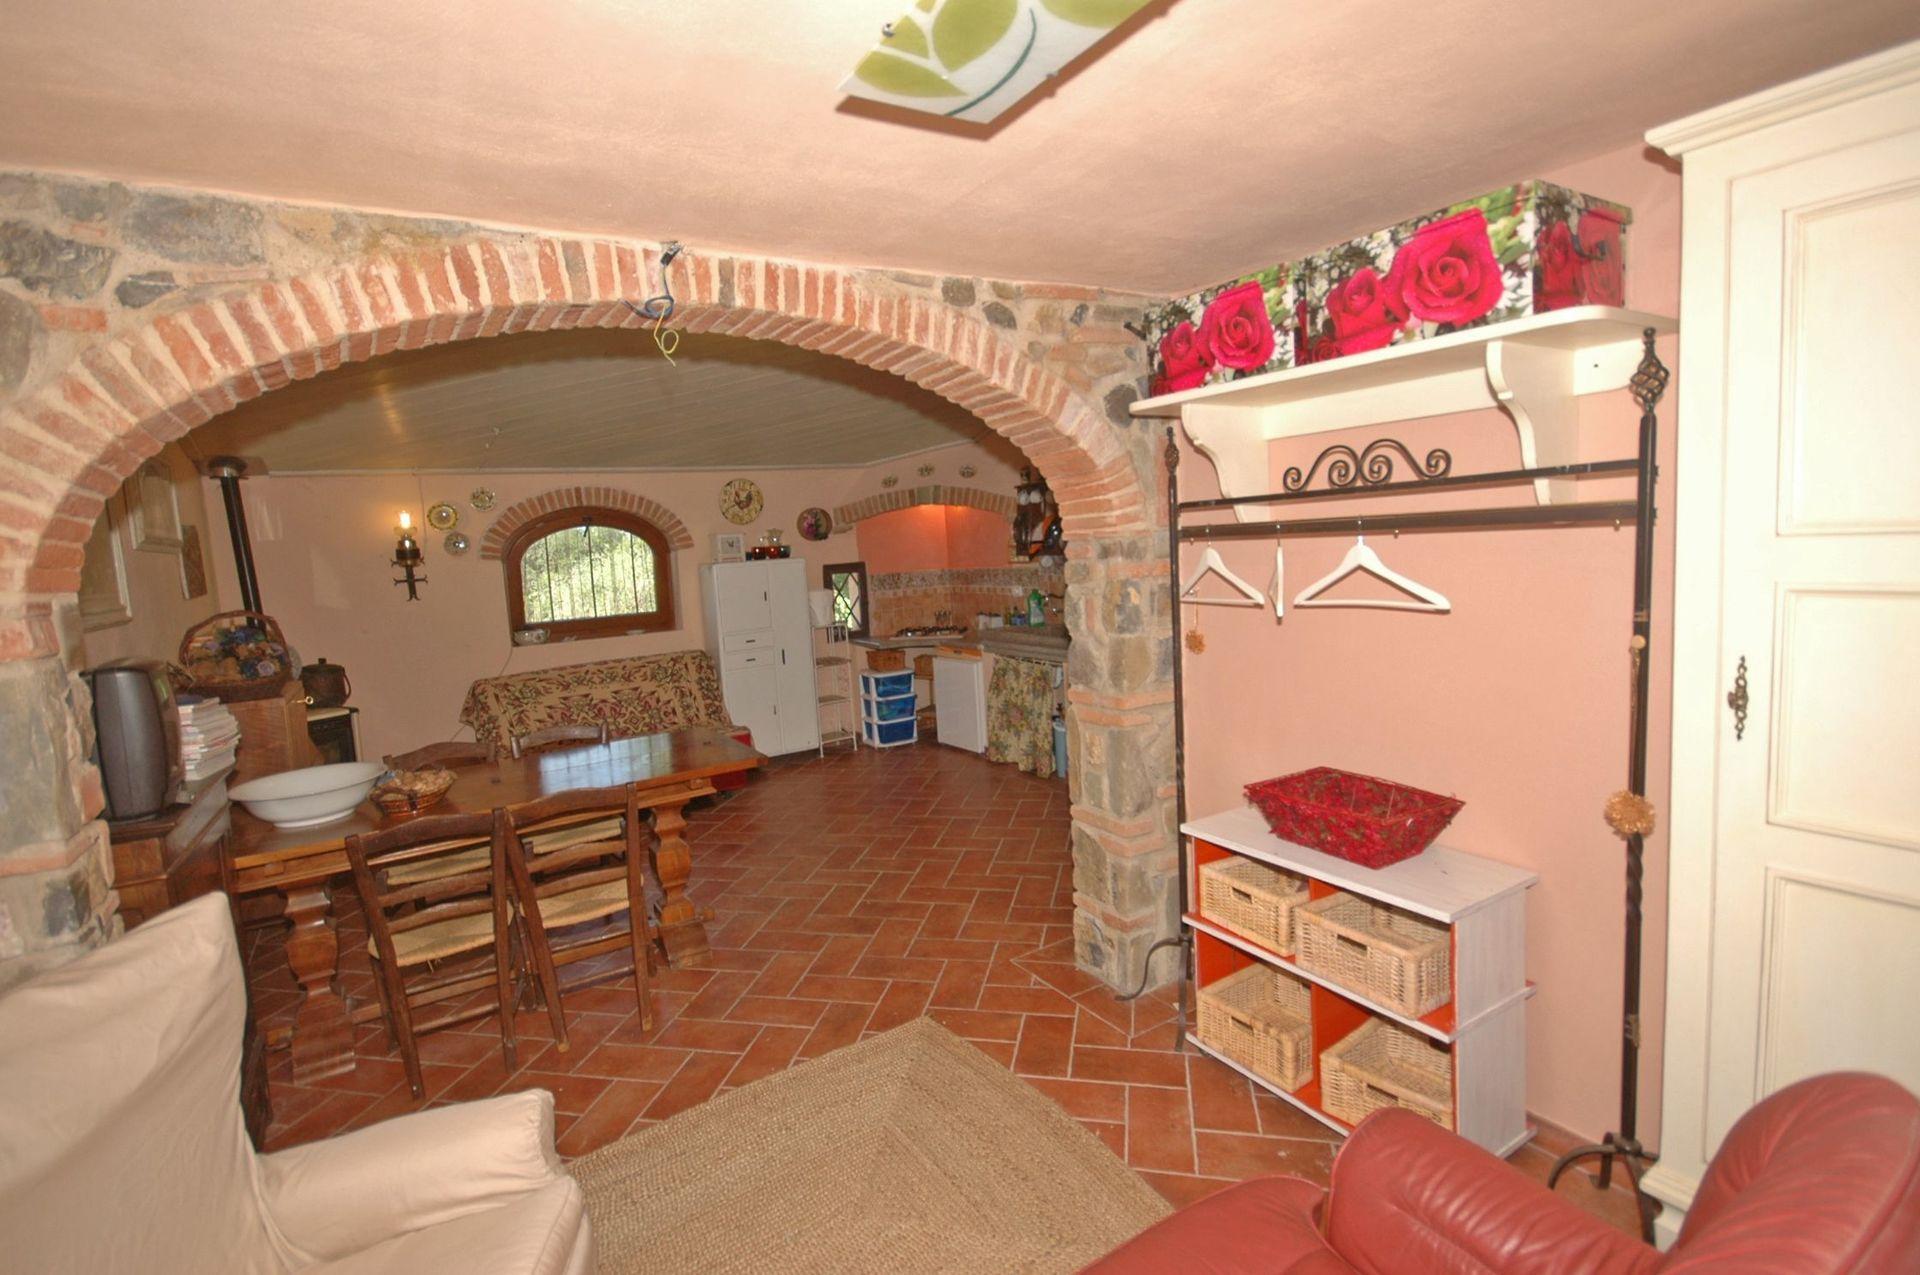 Laterina Villa Vacation Rental Casa Marco that sleeps 4 people in 1 ...